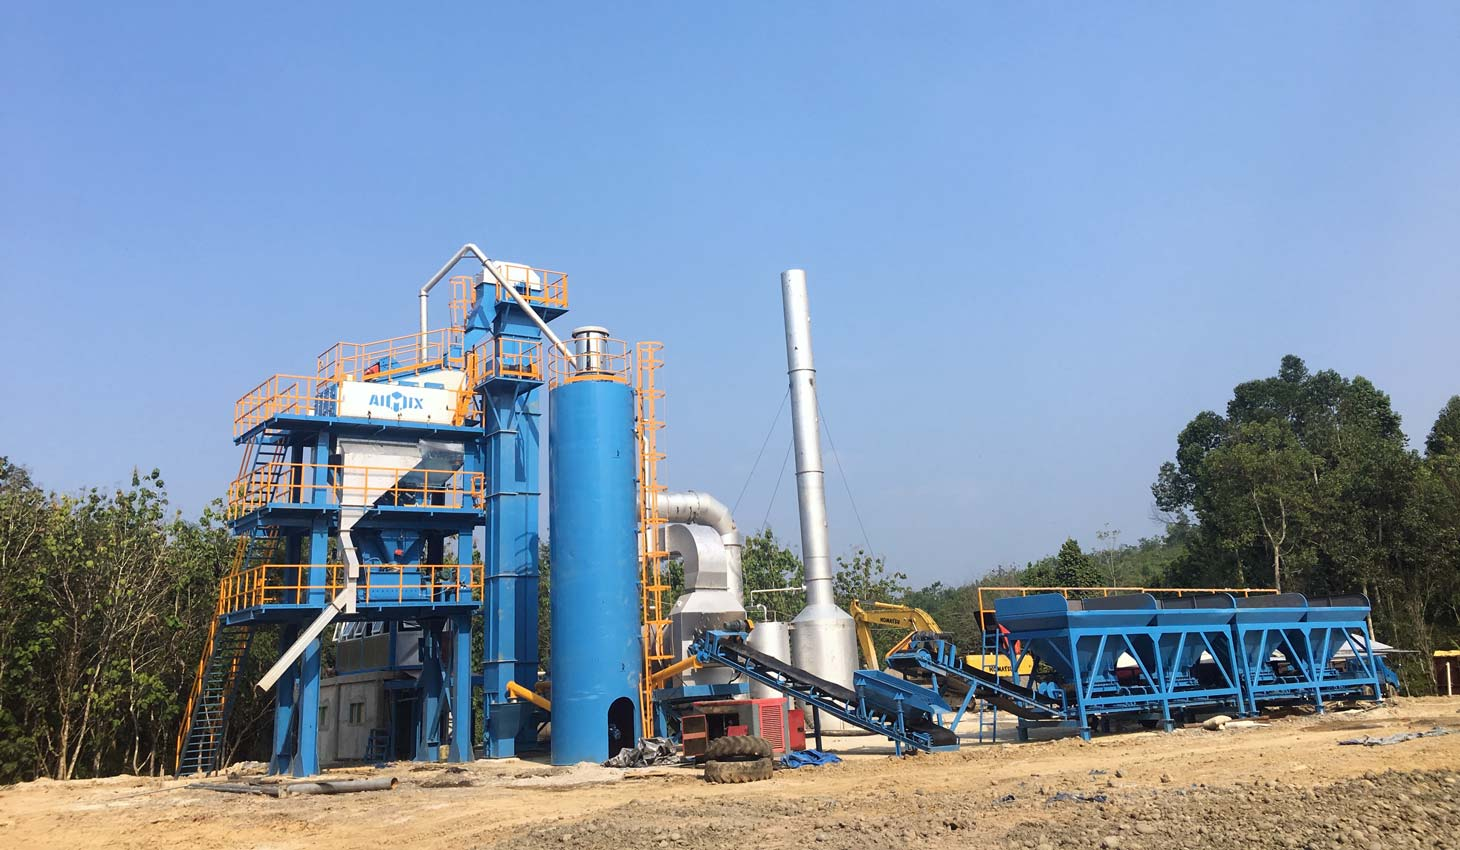 ALQ80 asphalt mixing plant